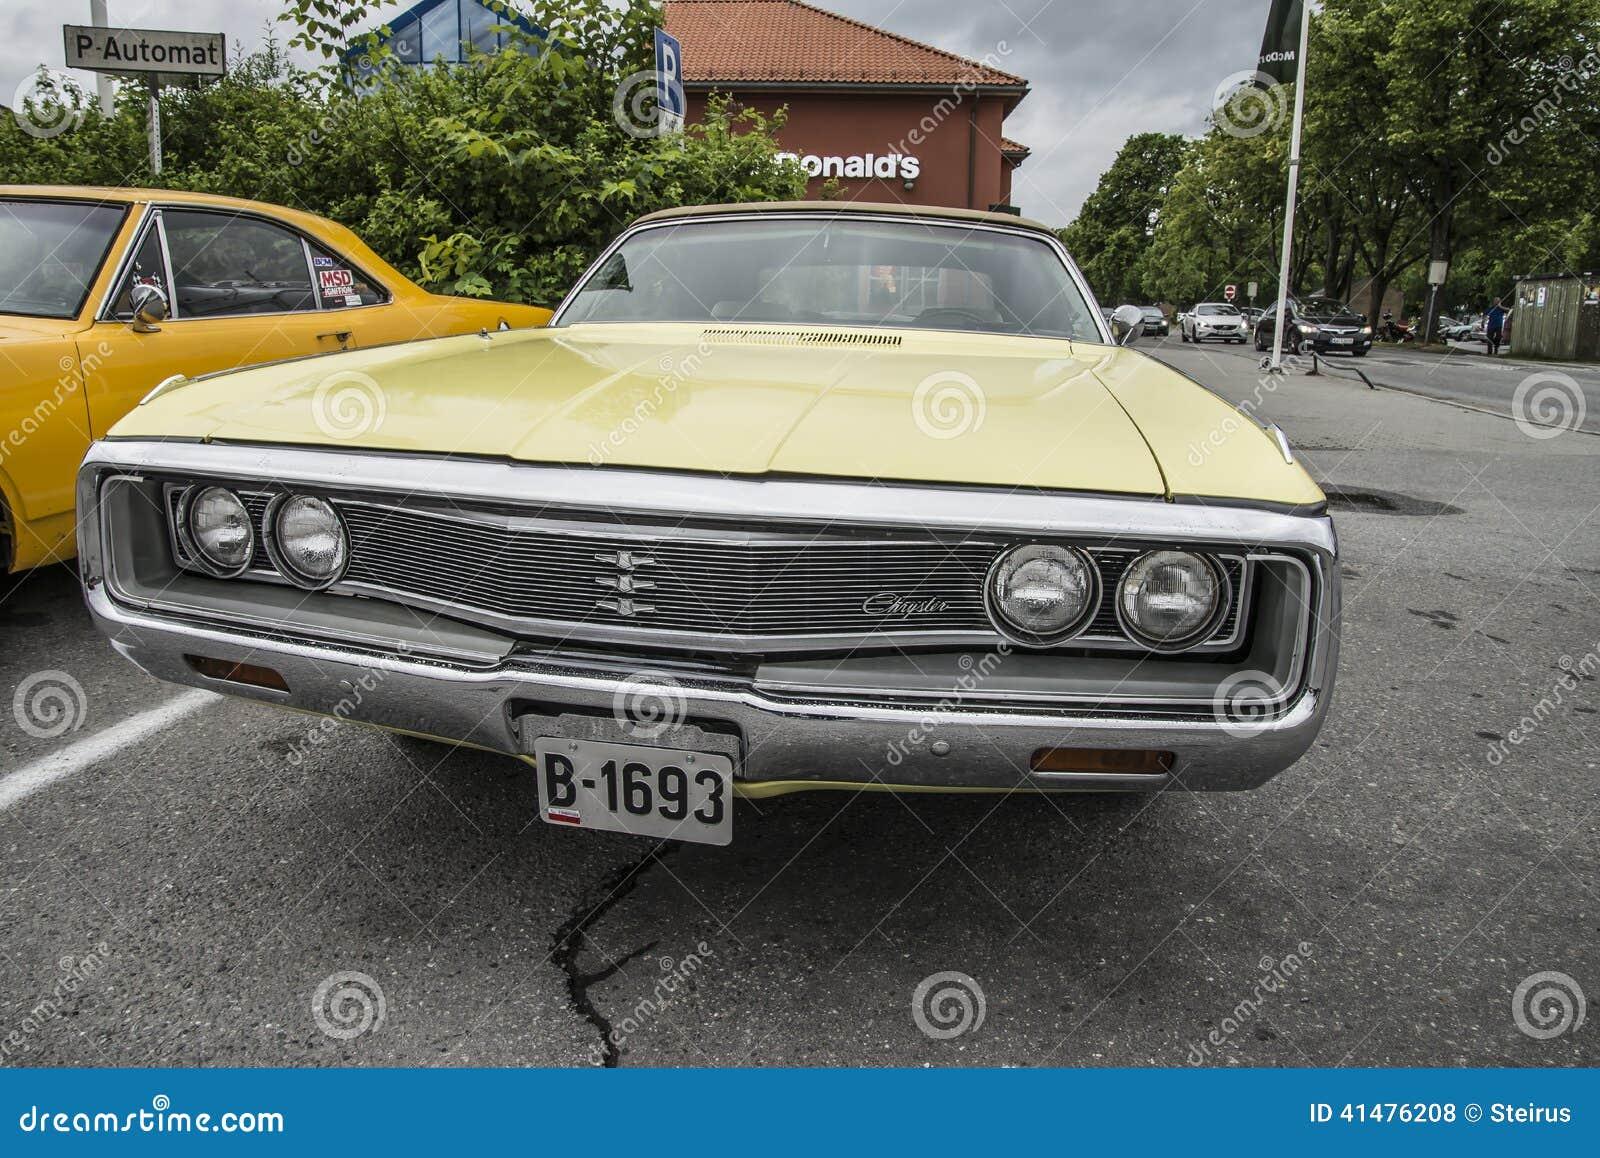 1969 Chrysler Newport Convertible Editorial Stock